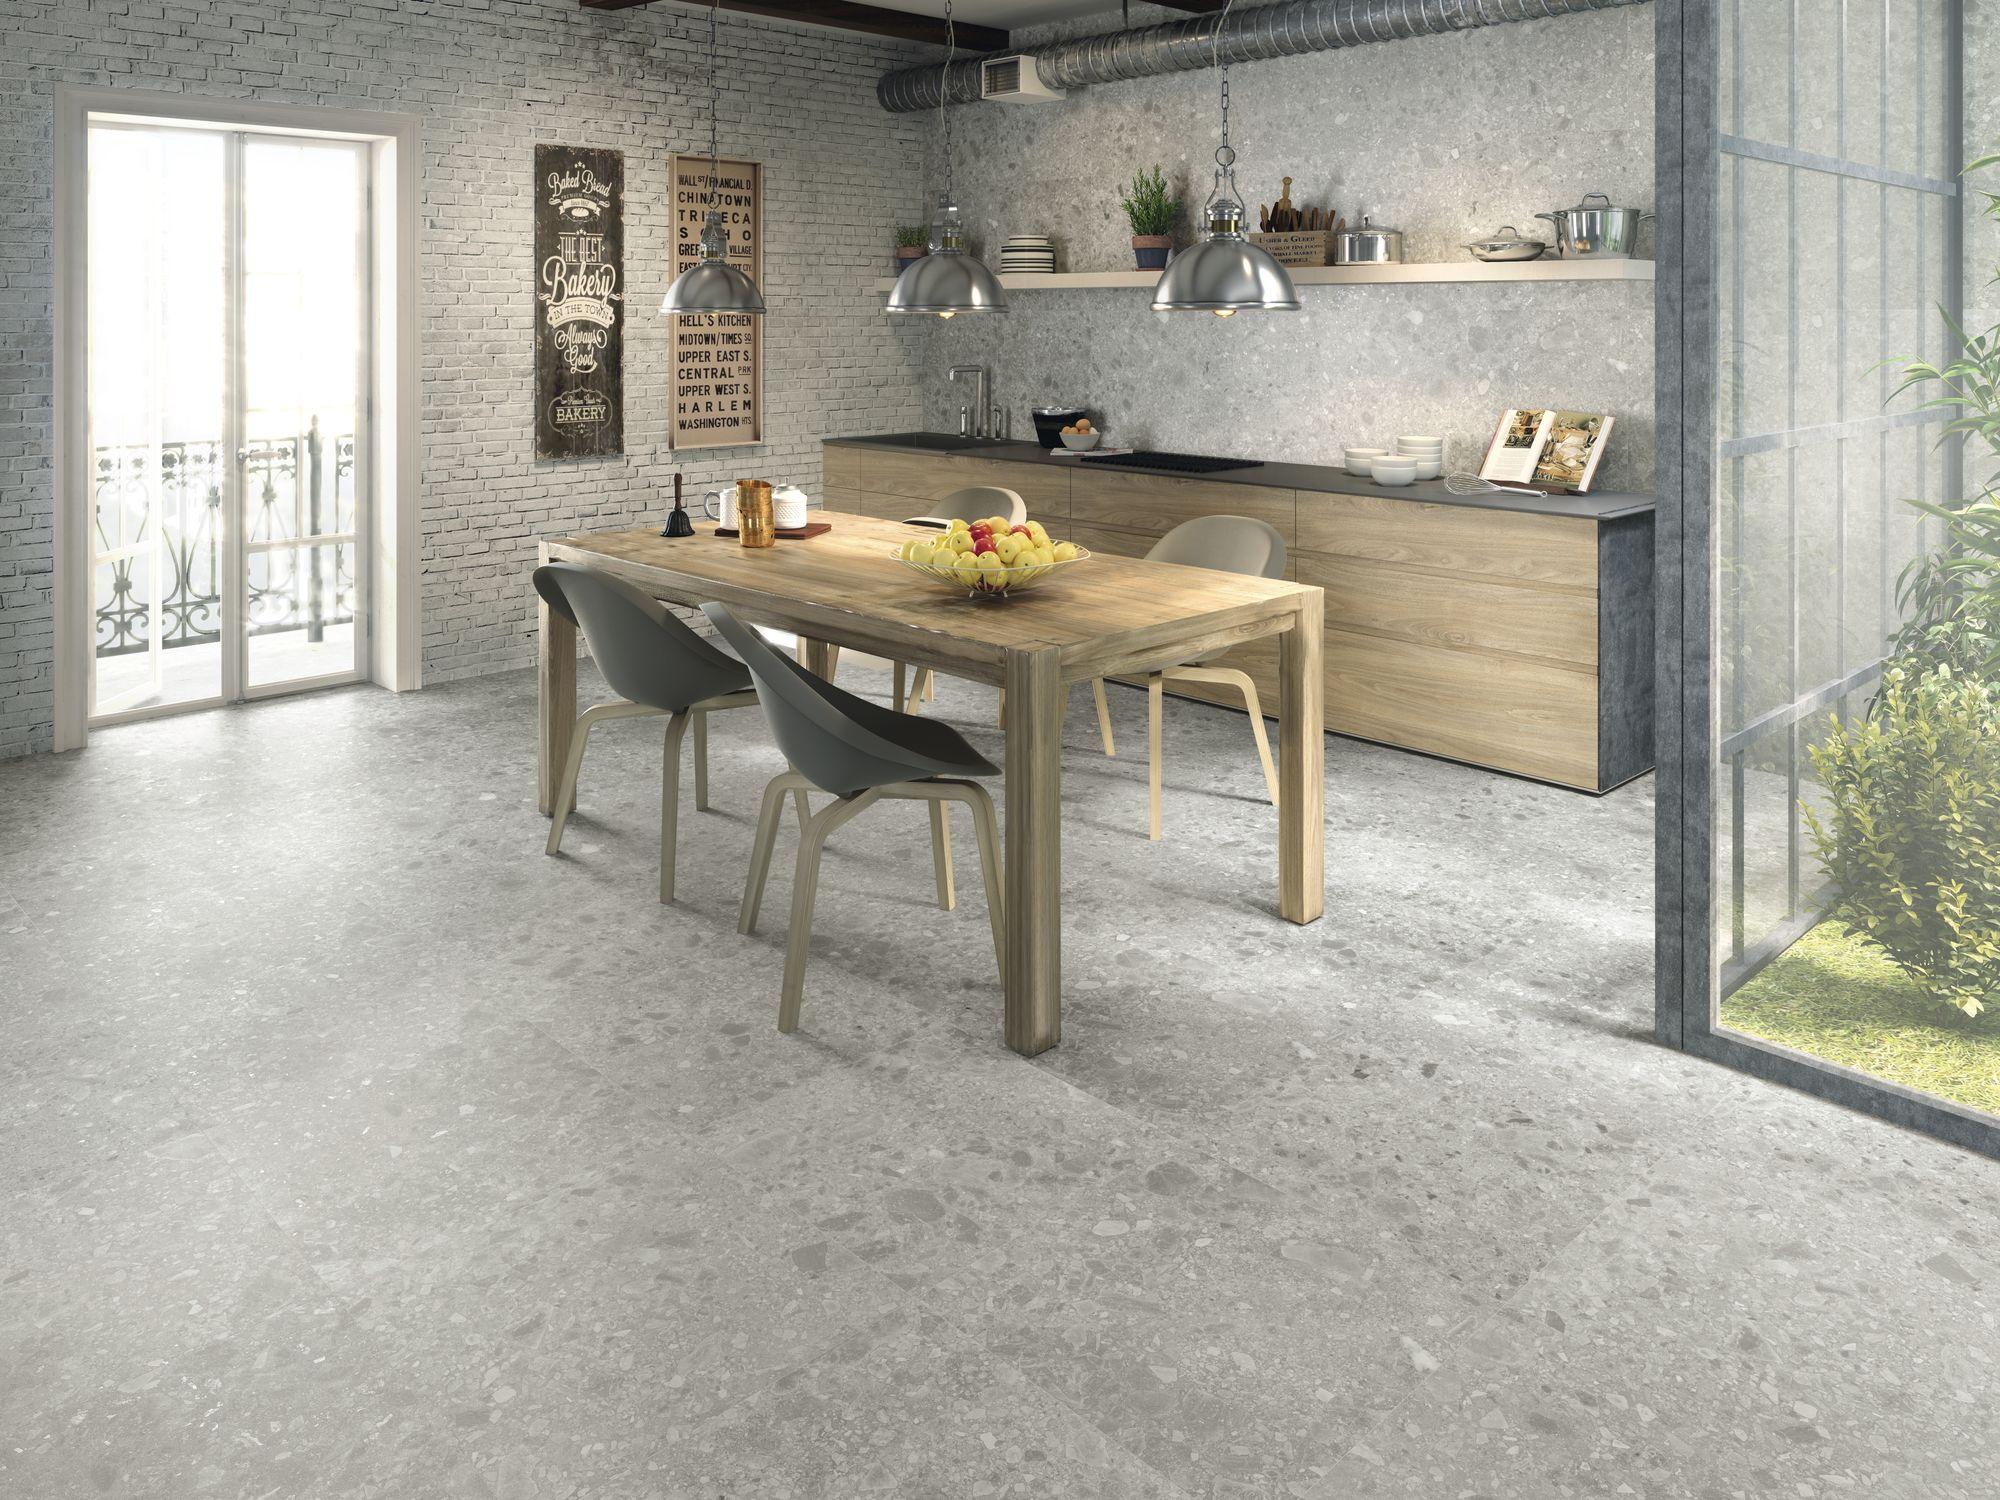 Hannover grey 40x80 cm.